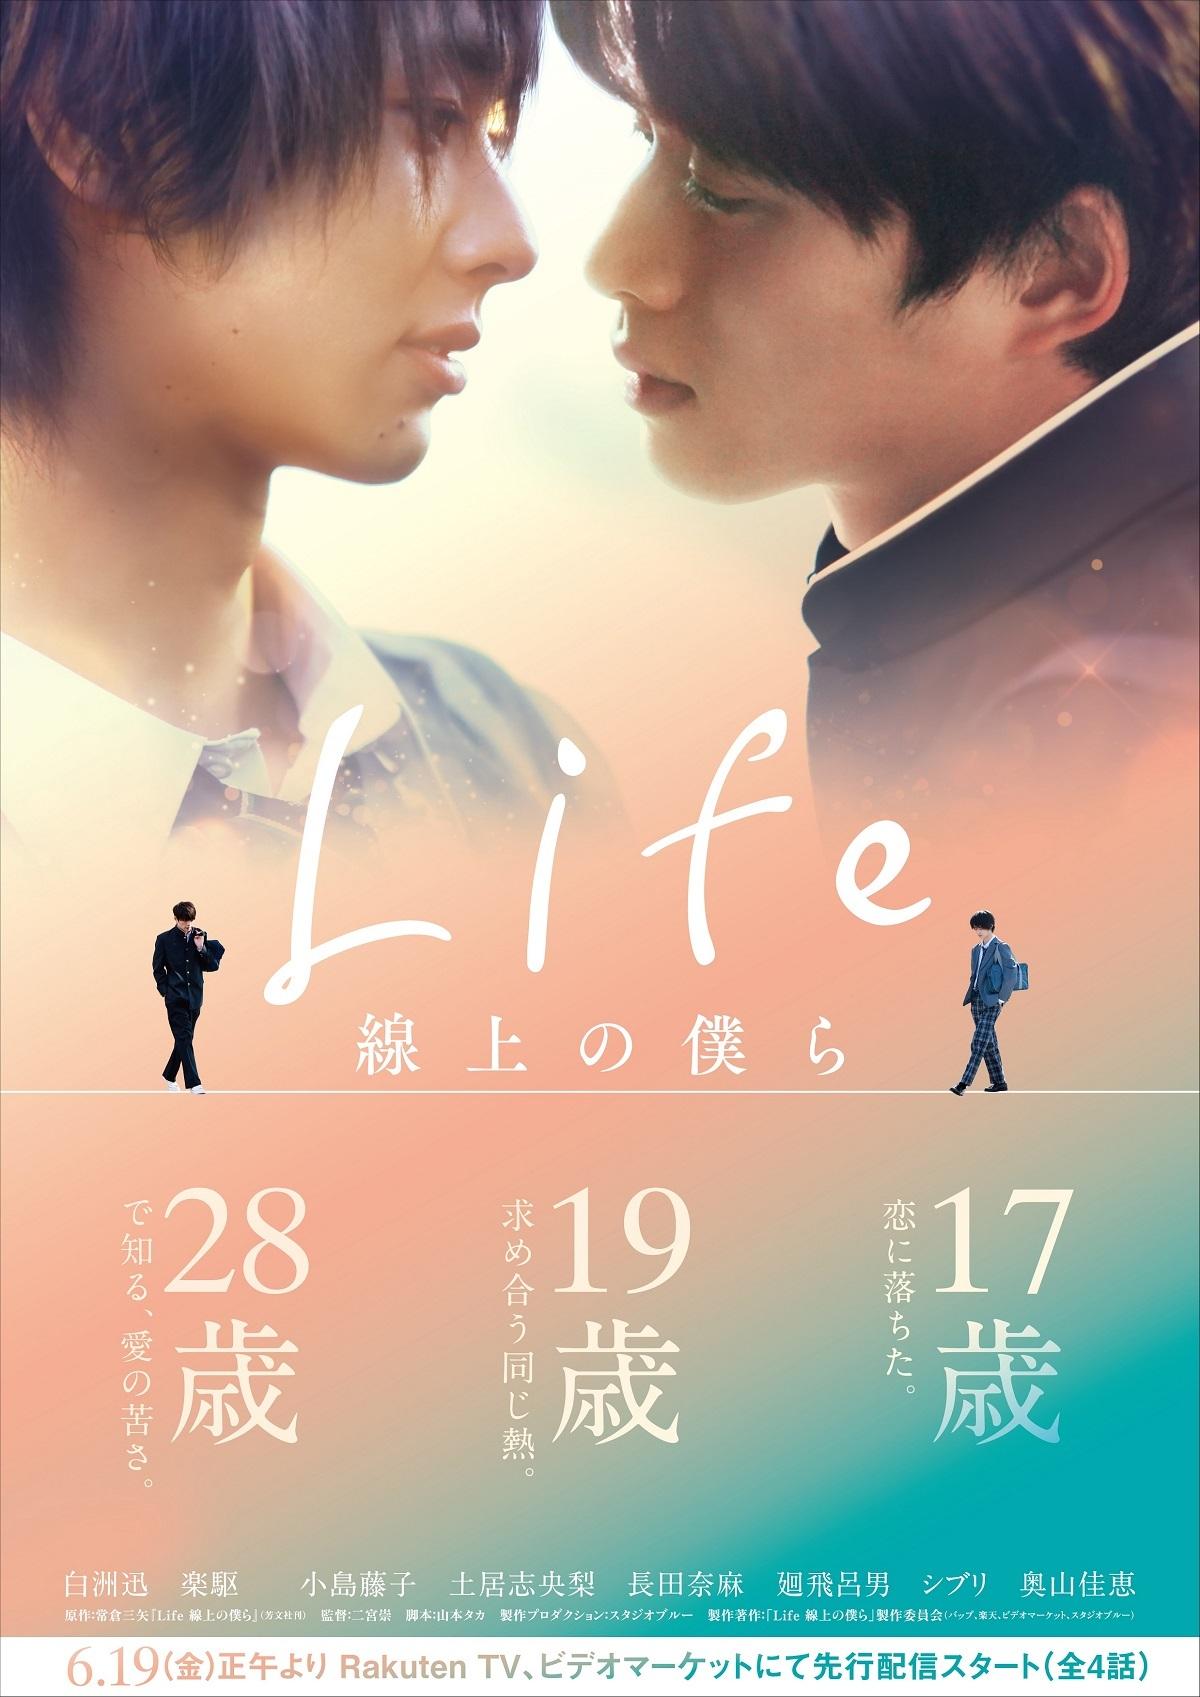 (C)「Life 線上の僕ら」製作委員会 (C)常倉三矢/芳文社